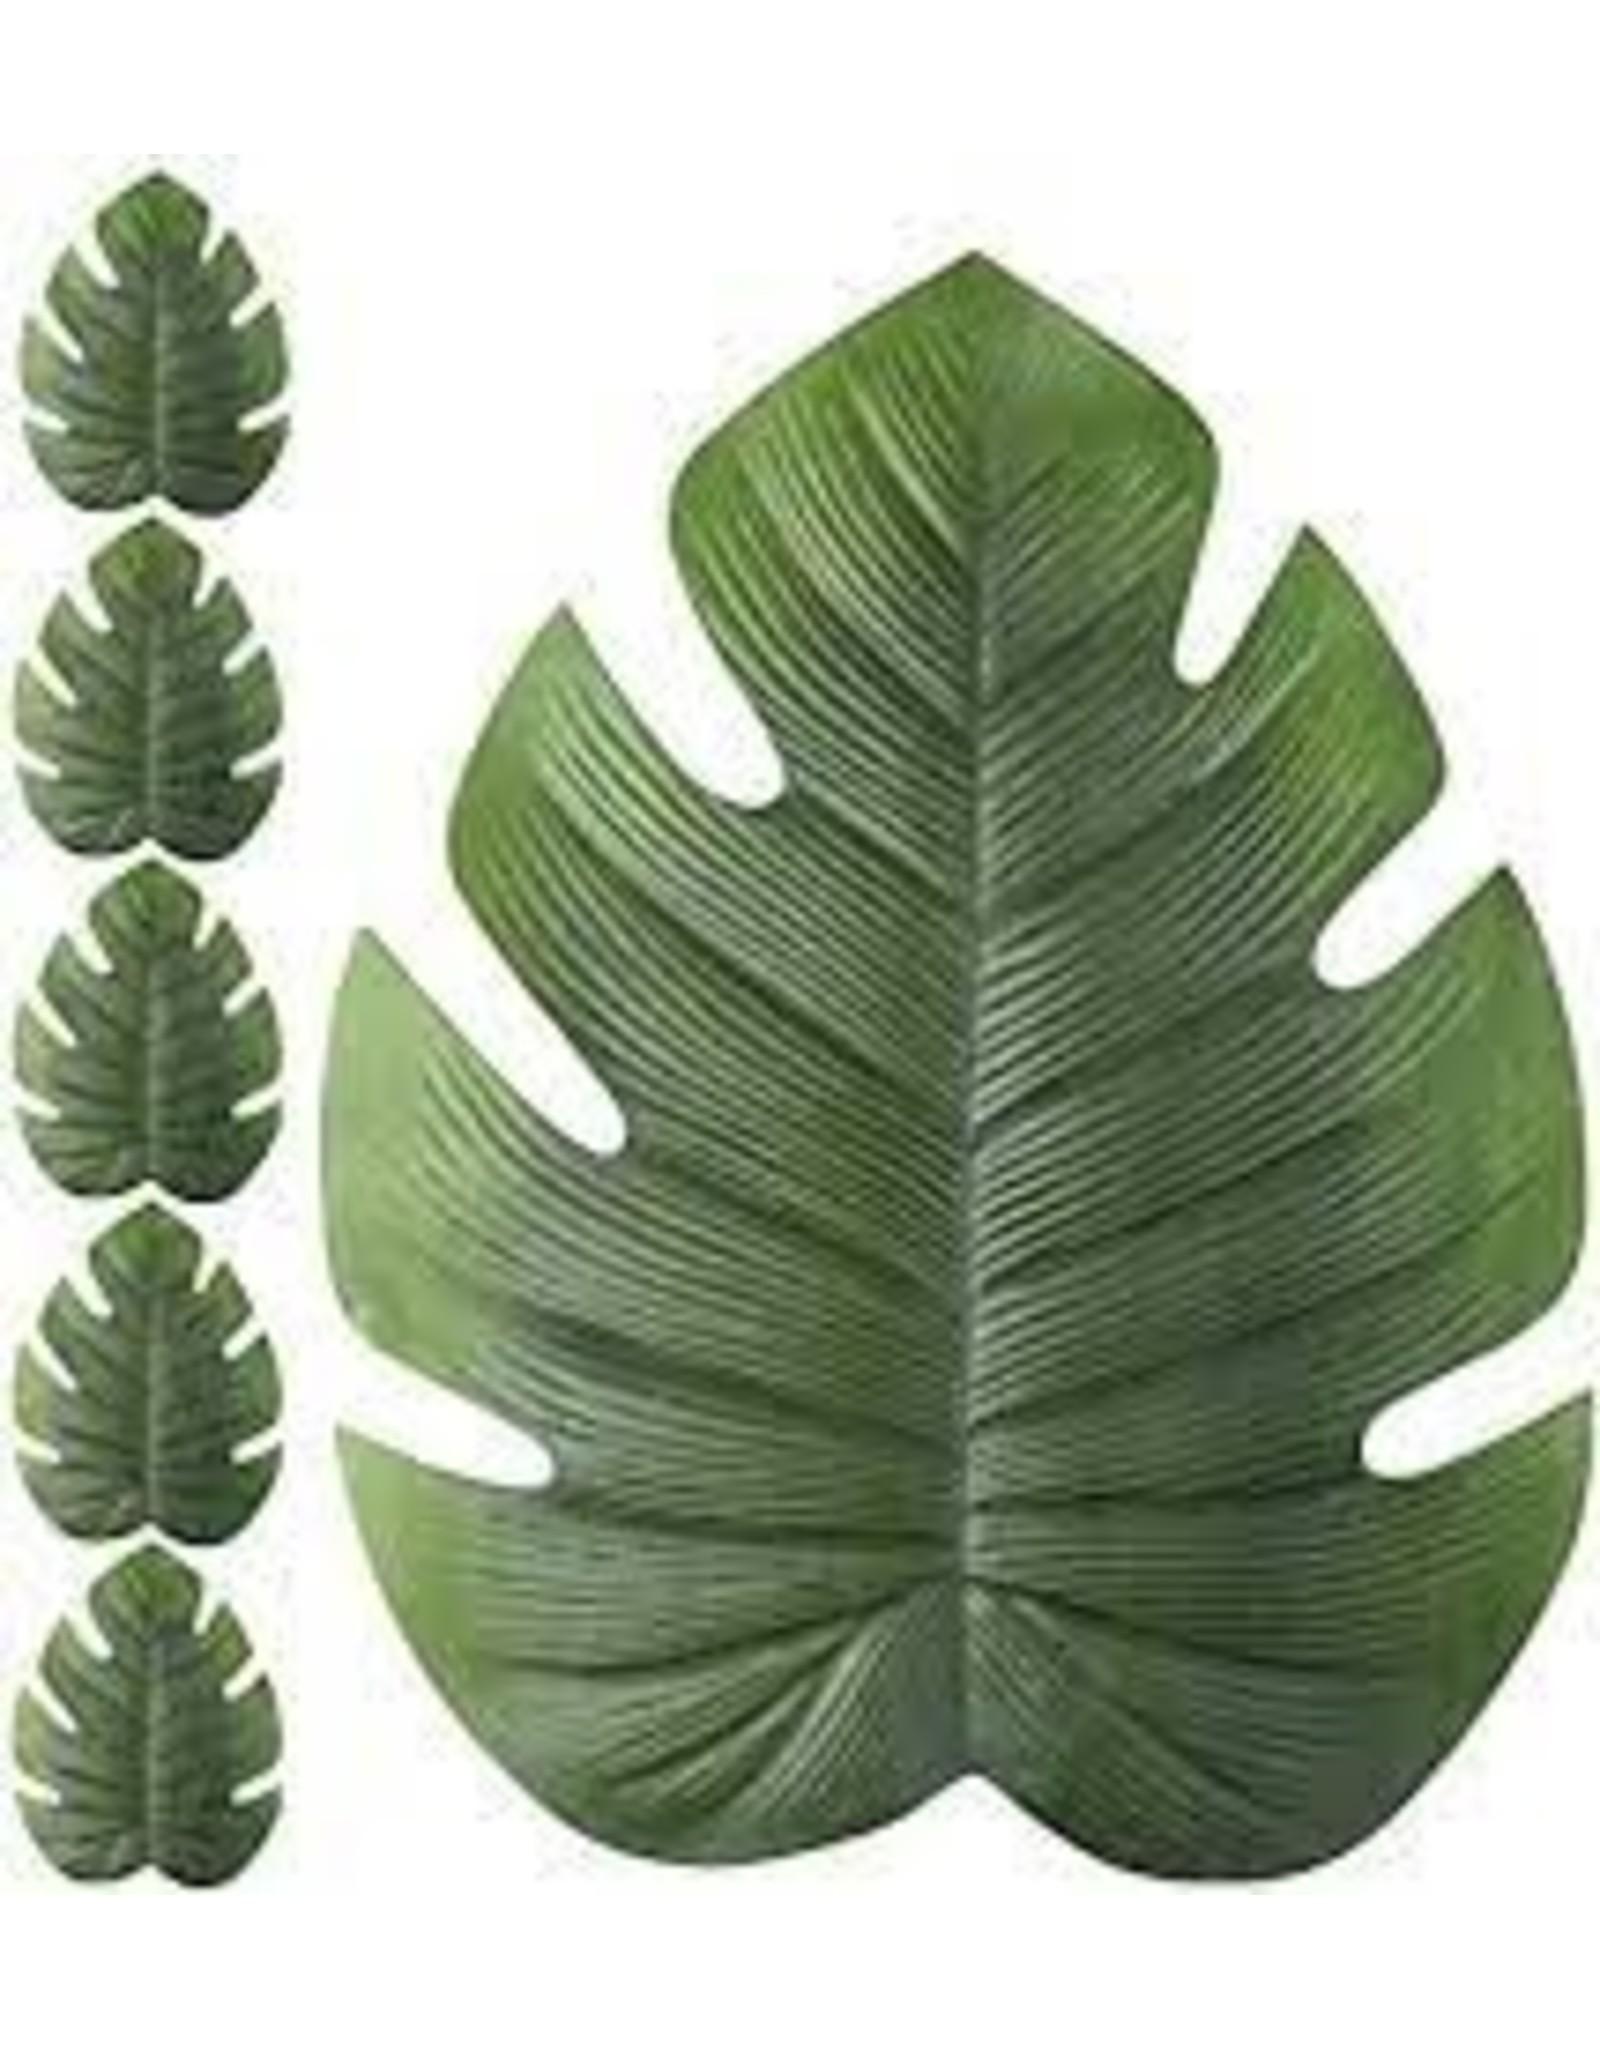 Design Imports DI Tropical Leaf placemat